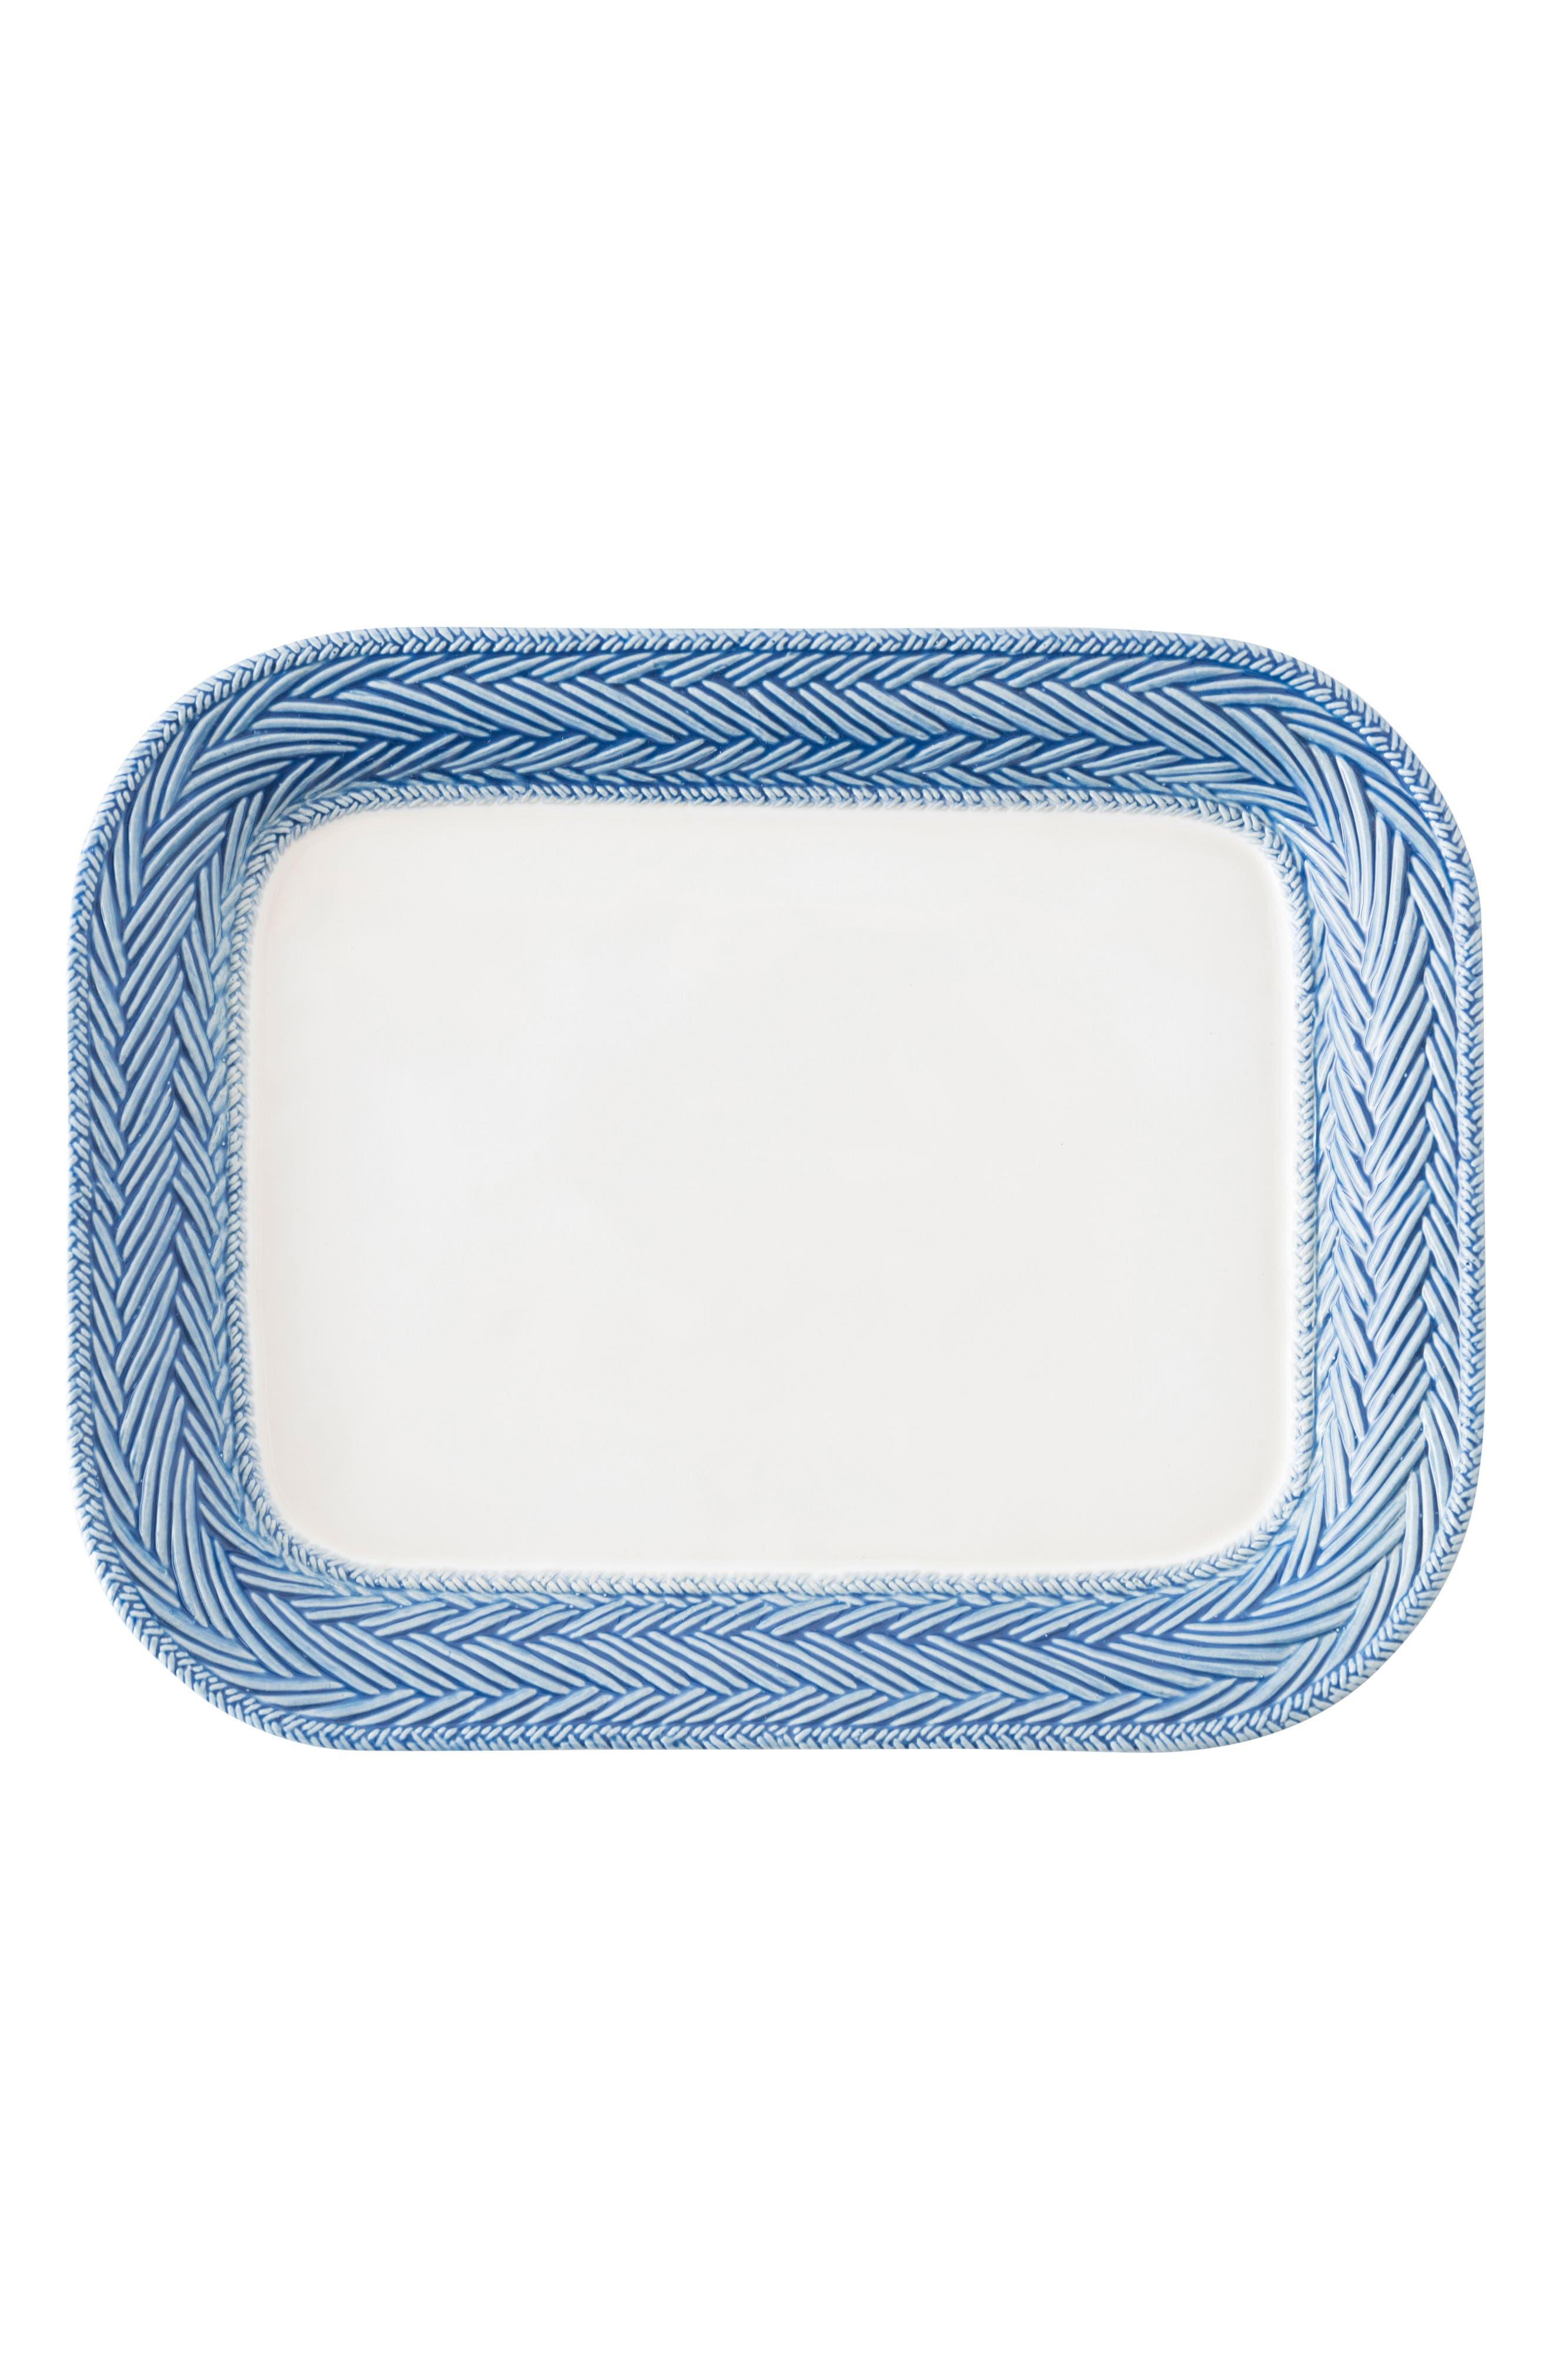 Alternate Image 1 Selected - Juliska Le Panier Serving Platter